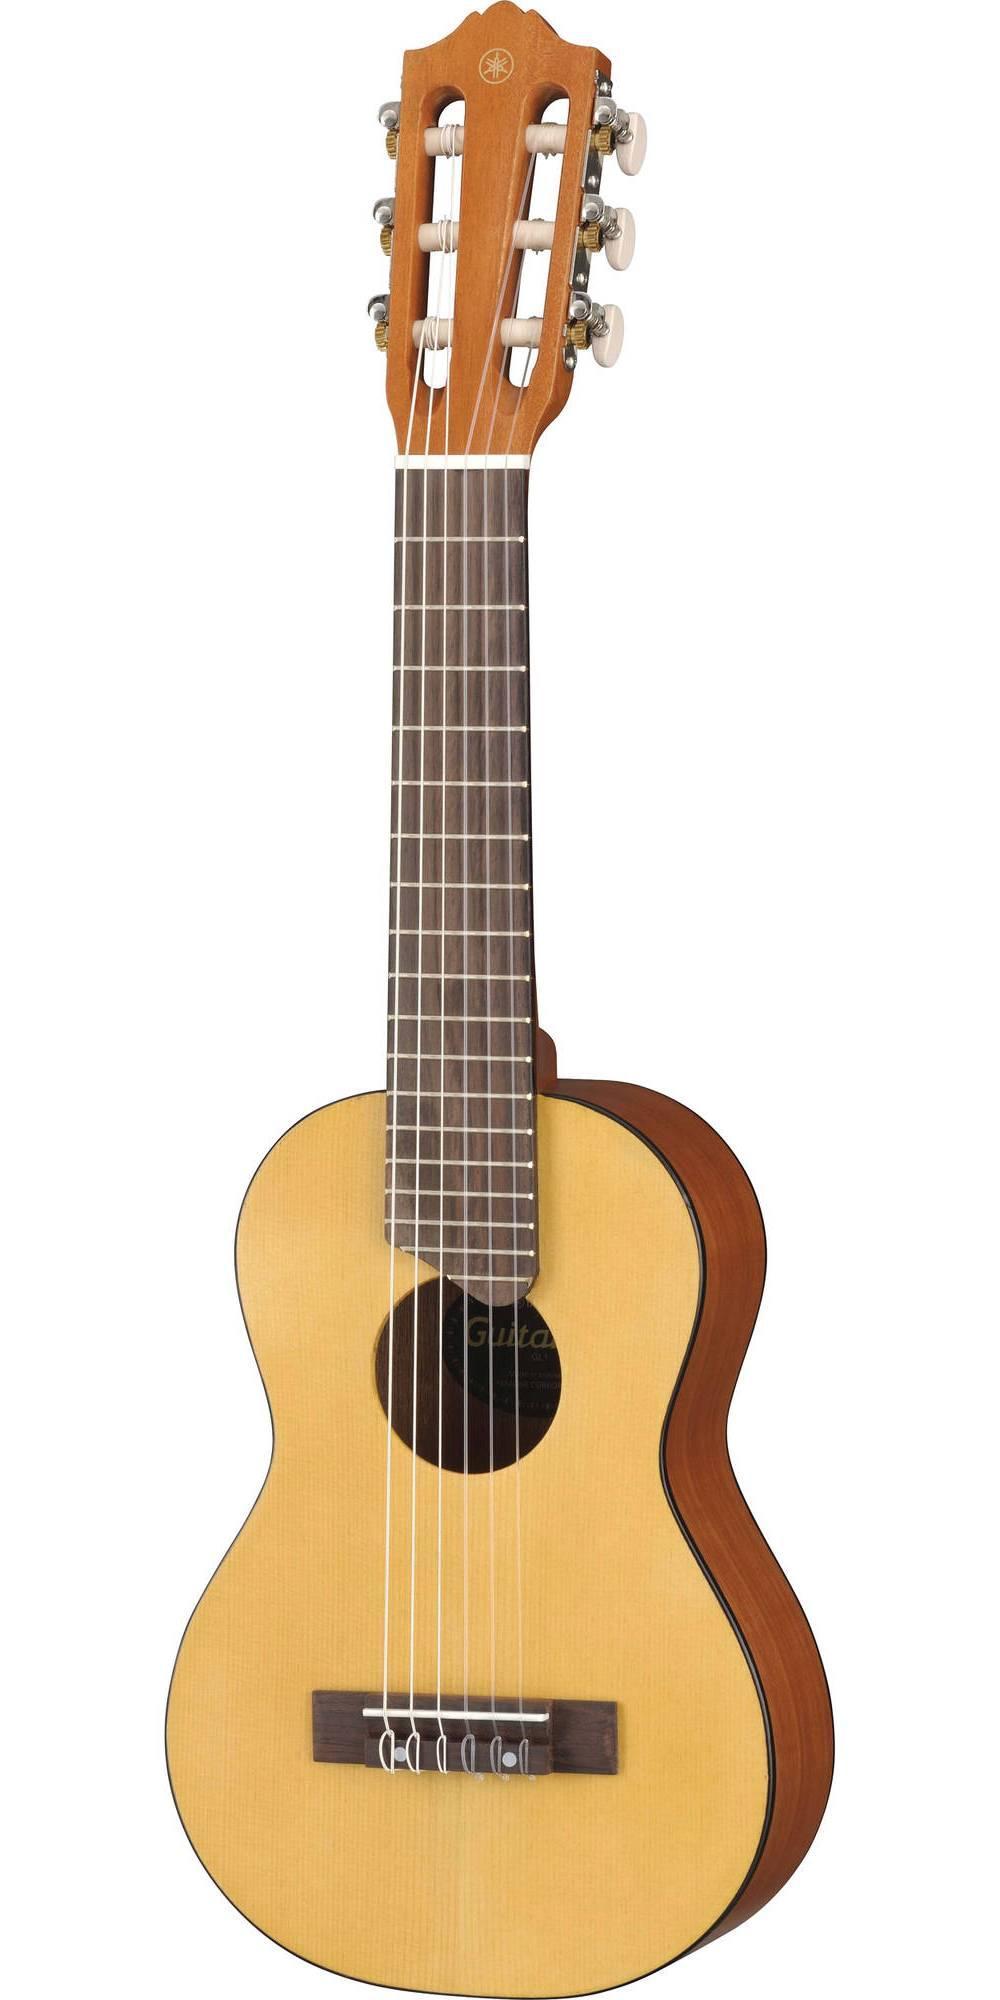 Картинки маленькие гитары